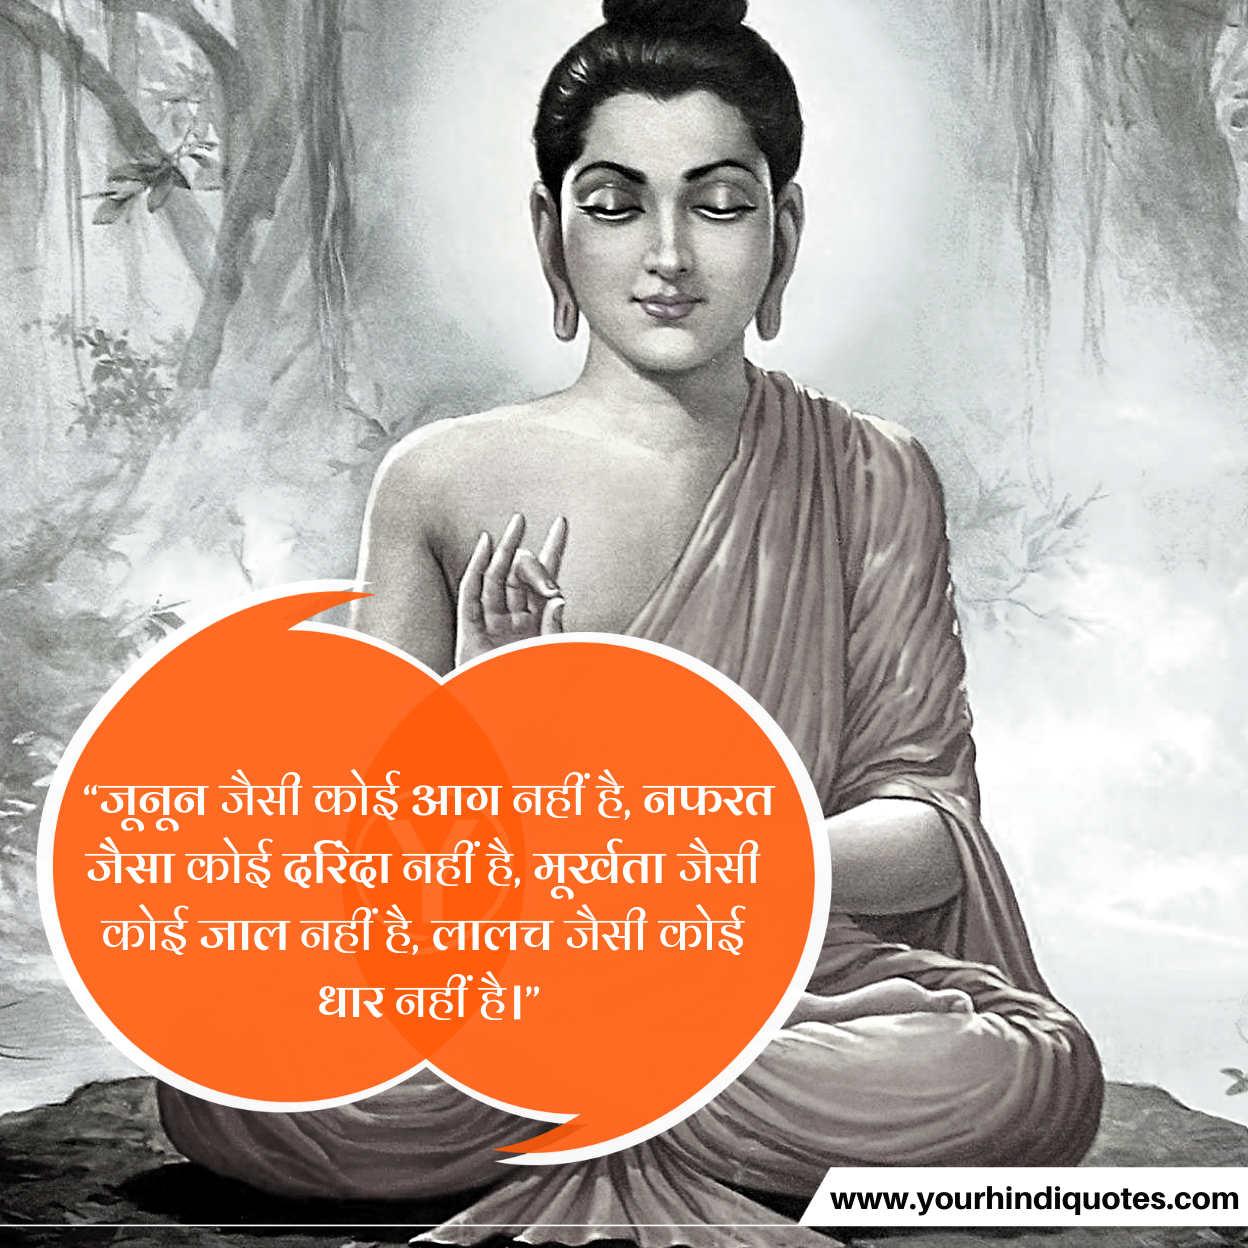 Gautam Buddha Hindi Updesh Images